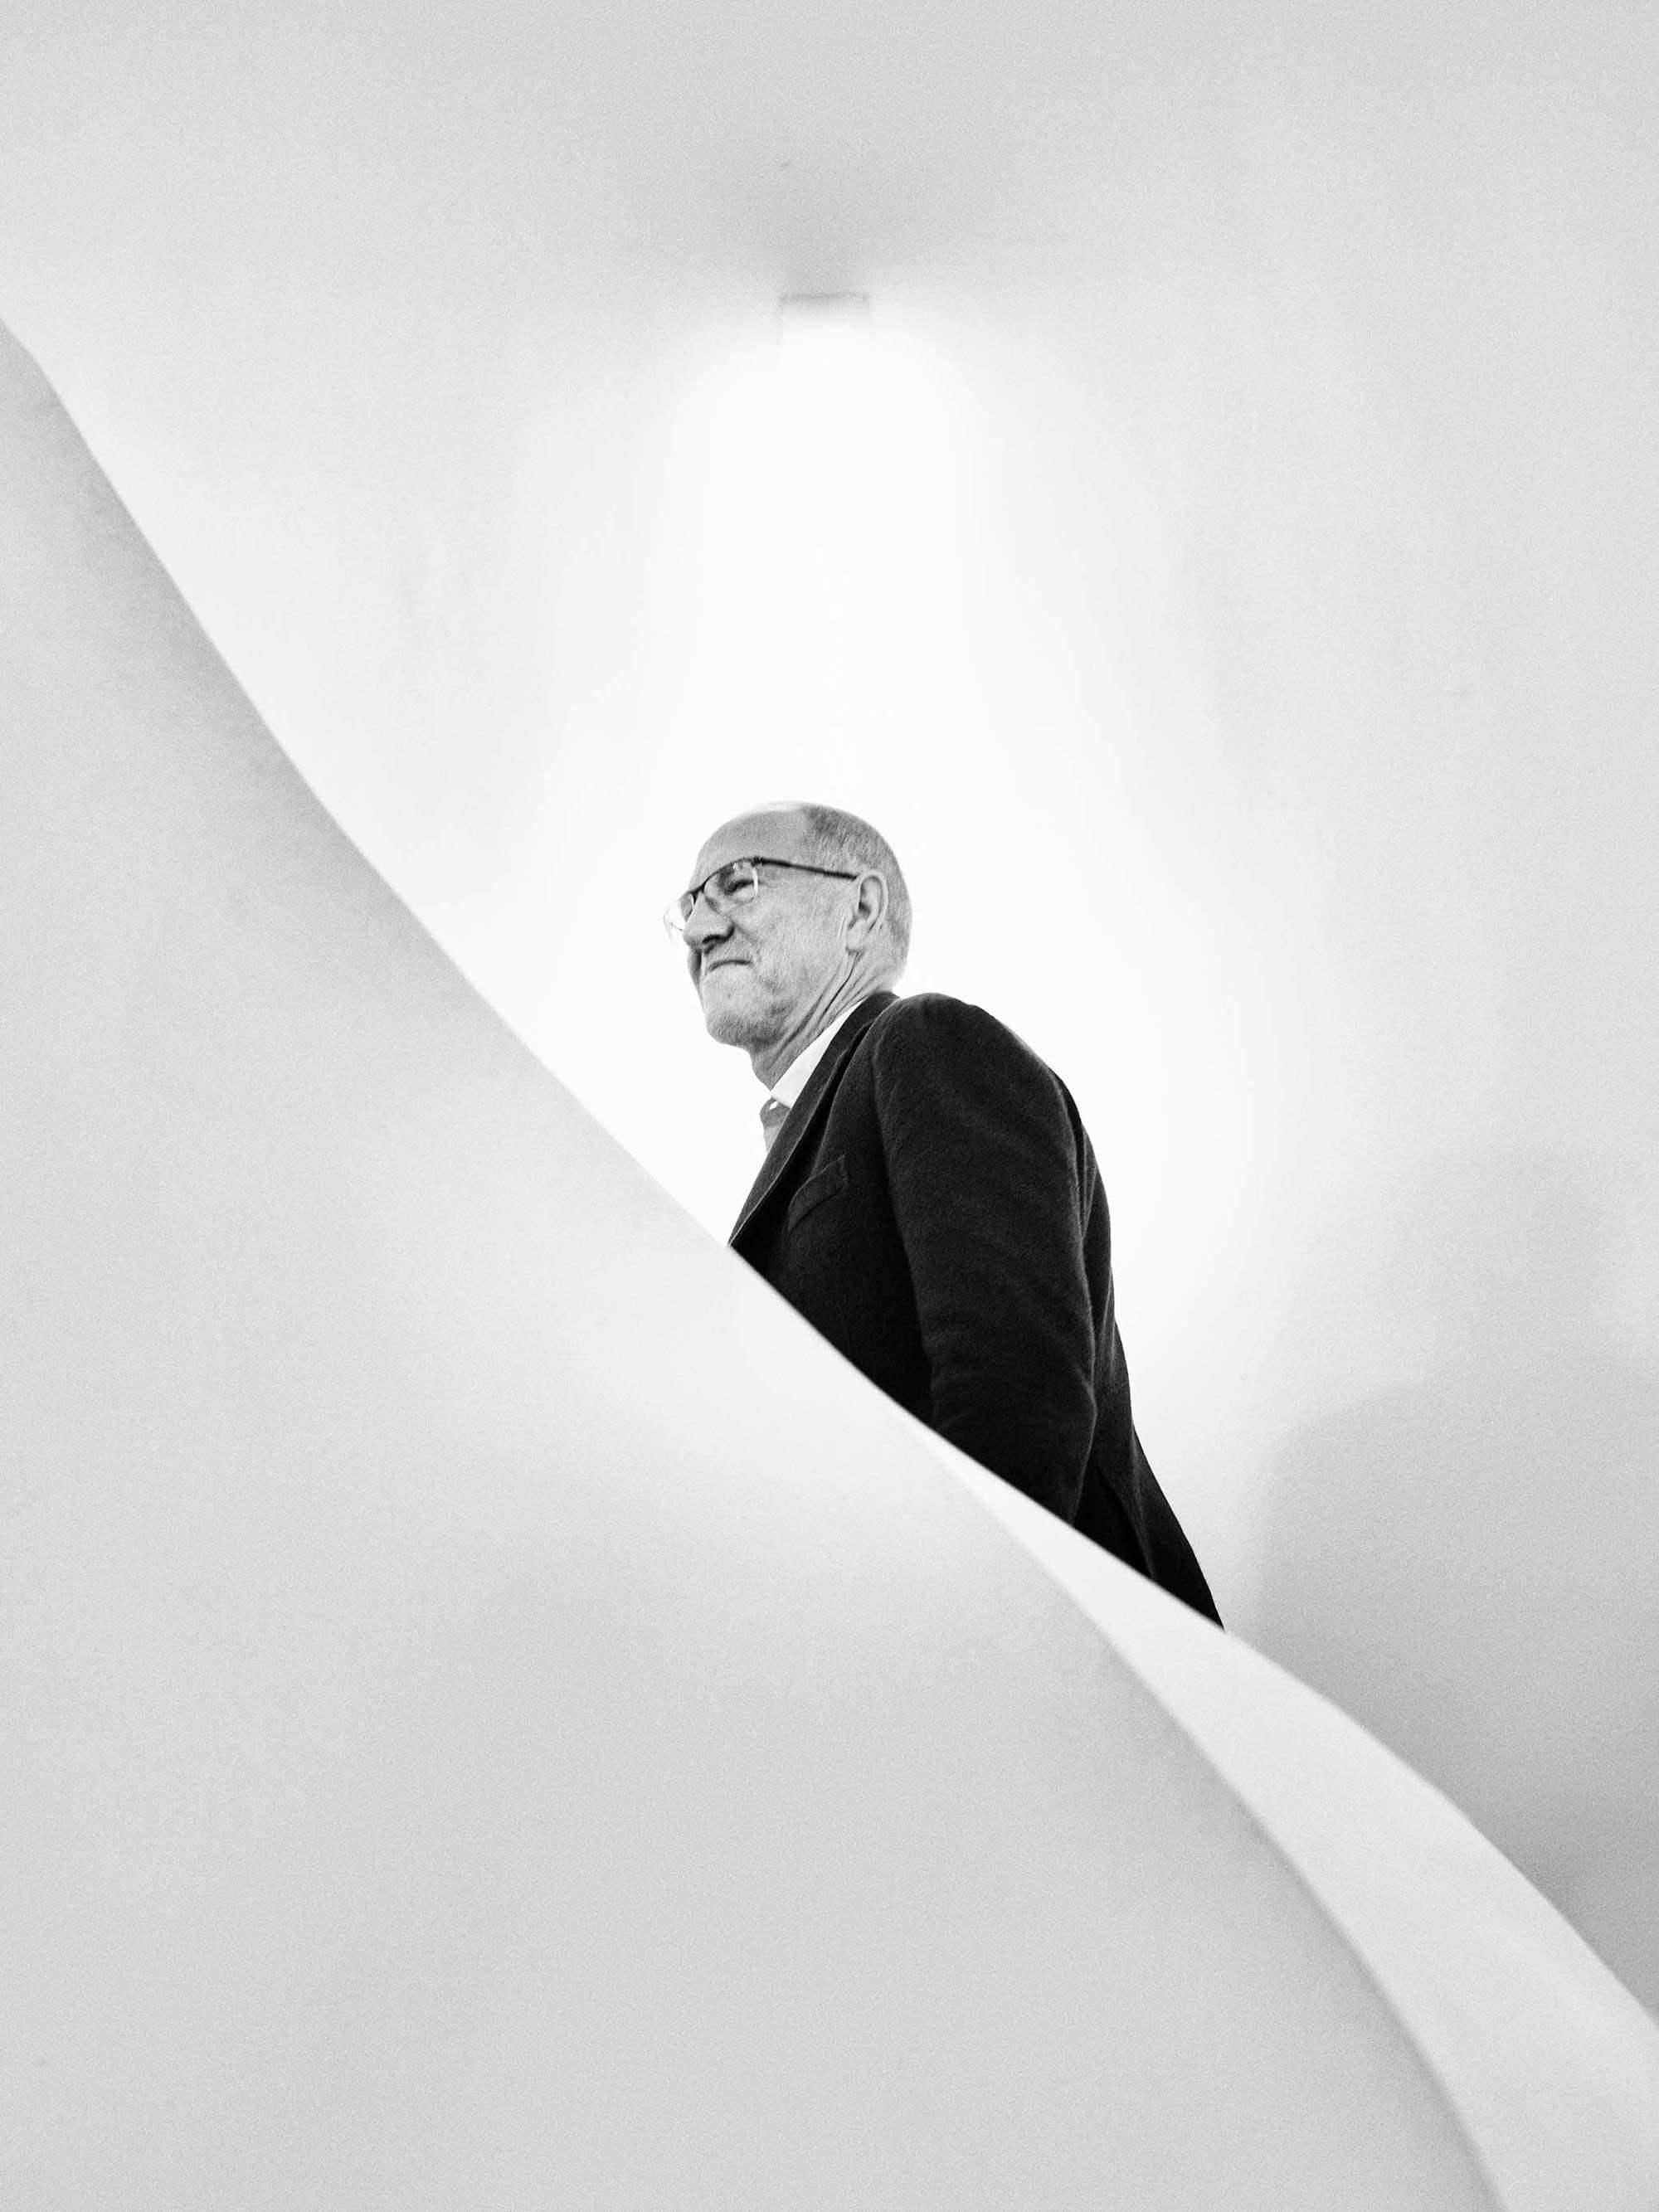 R-Biopharm AG: Ralf Dreher auf der Treppe